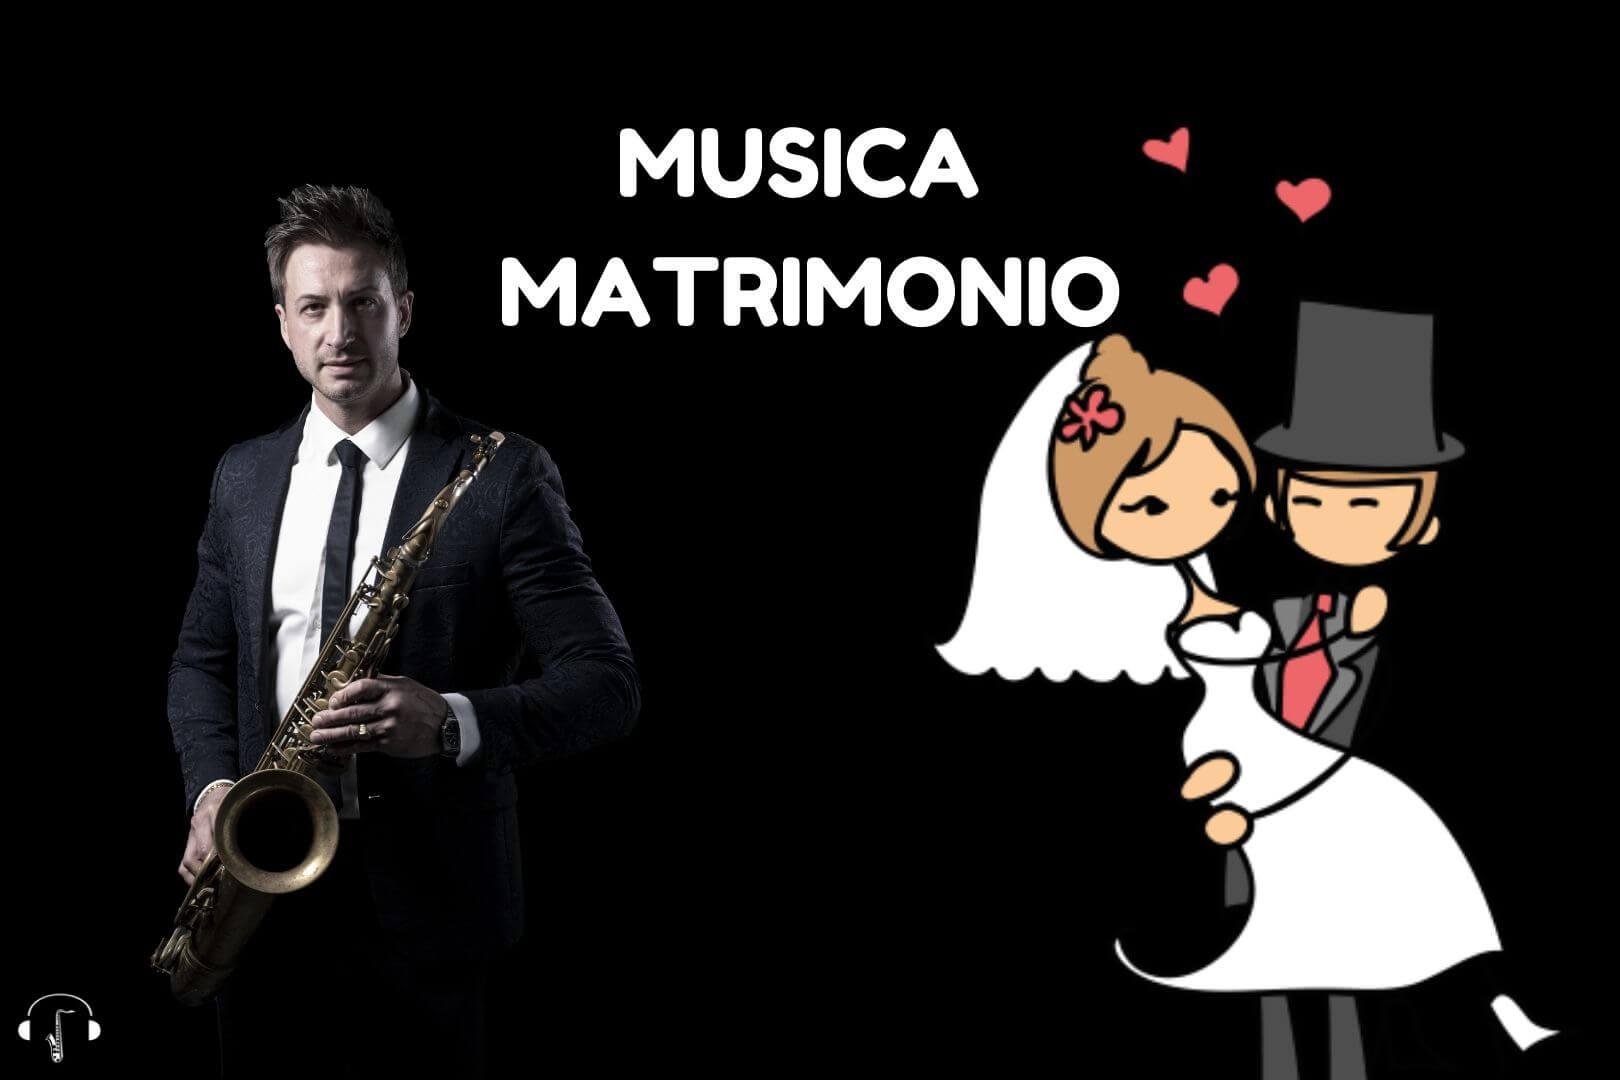 dj-sax-matrimonio-musica